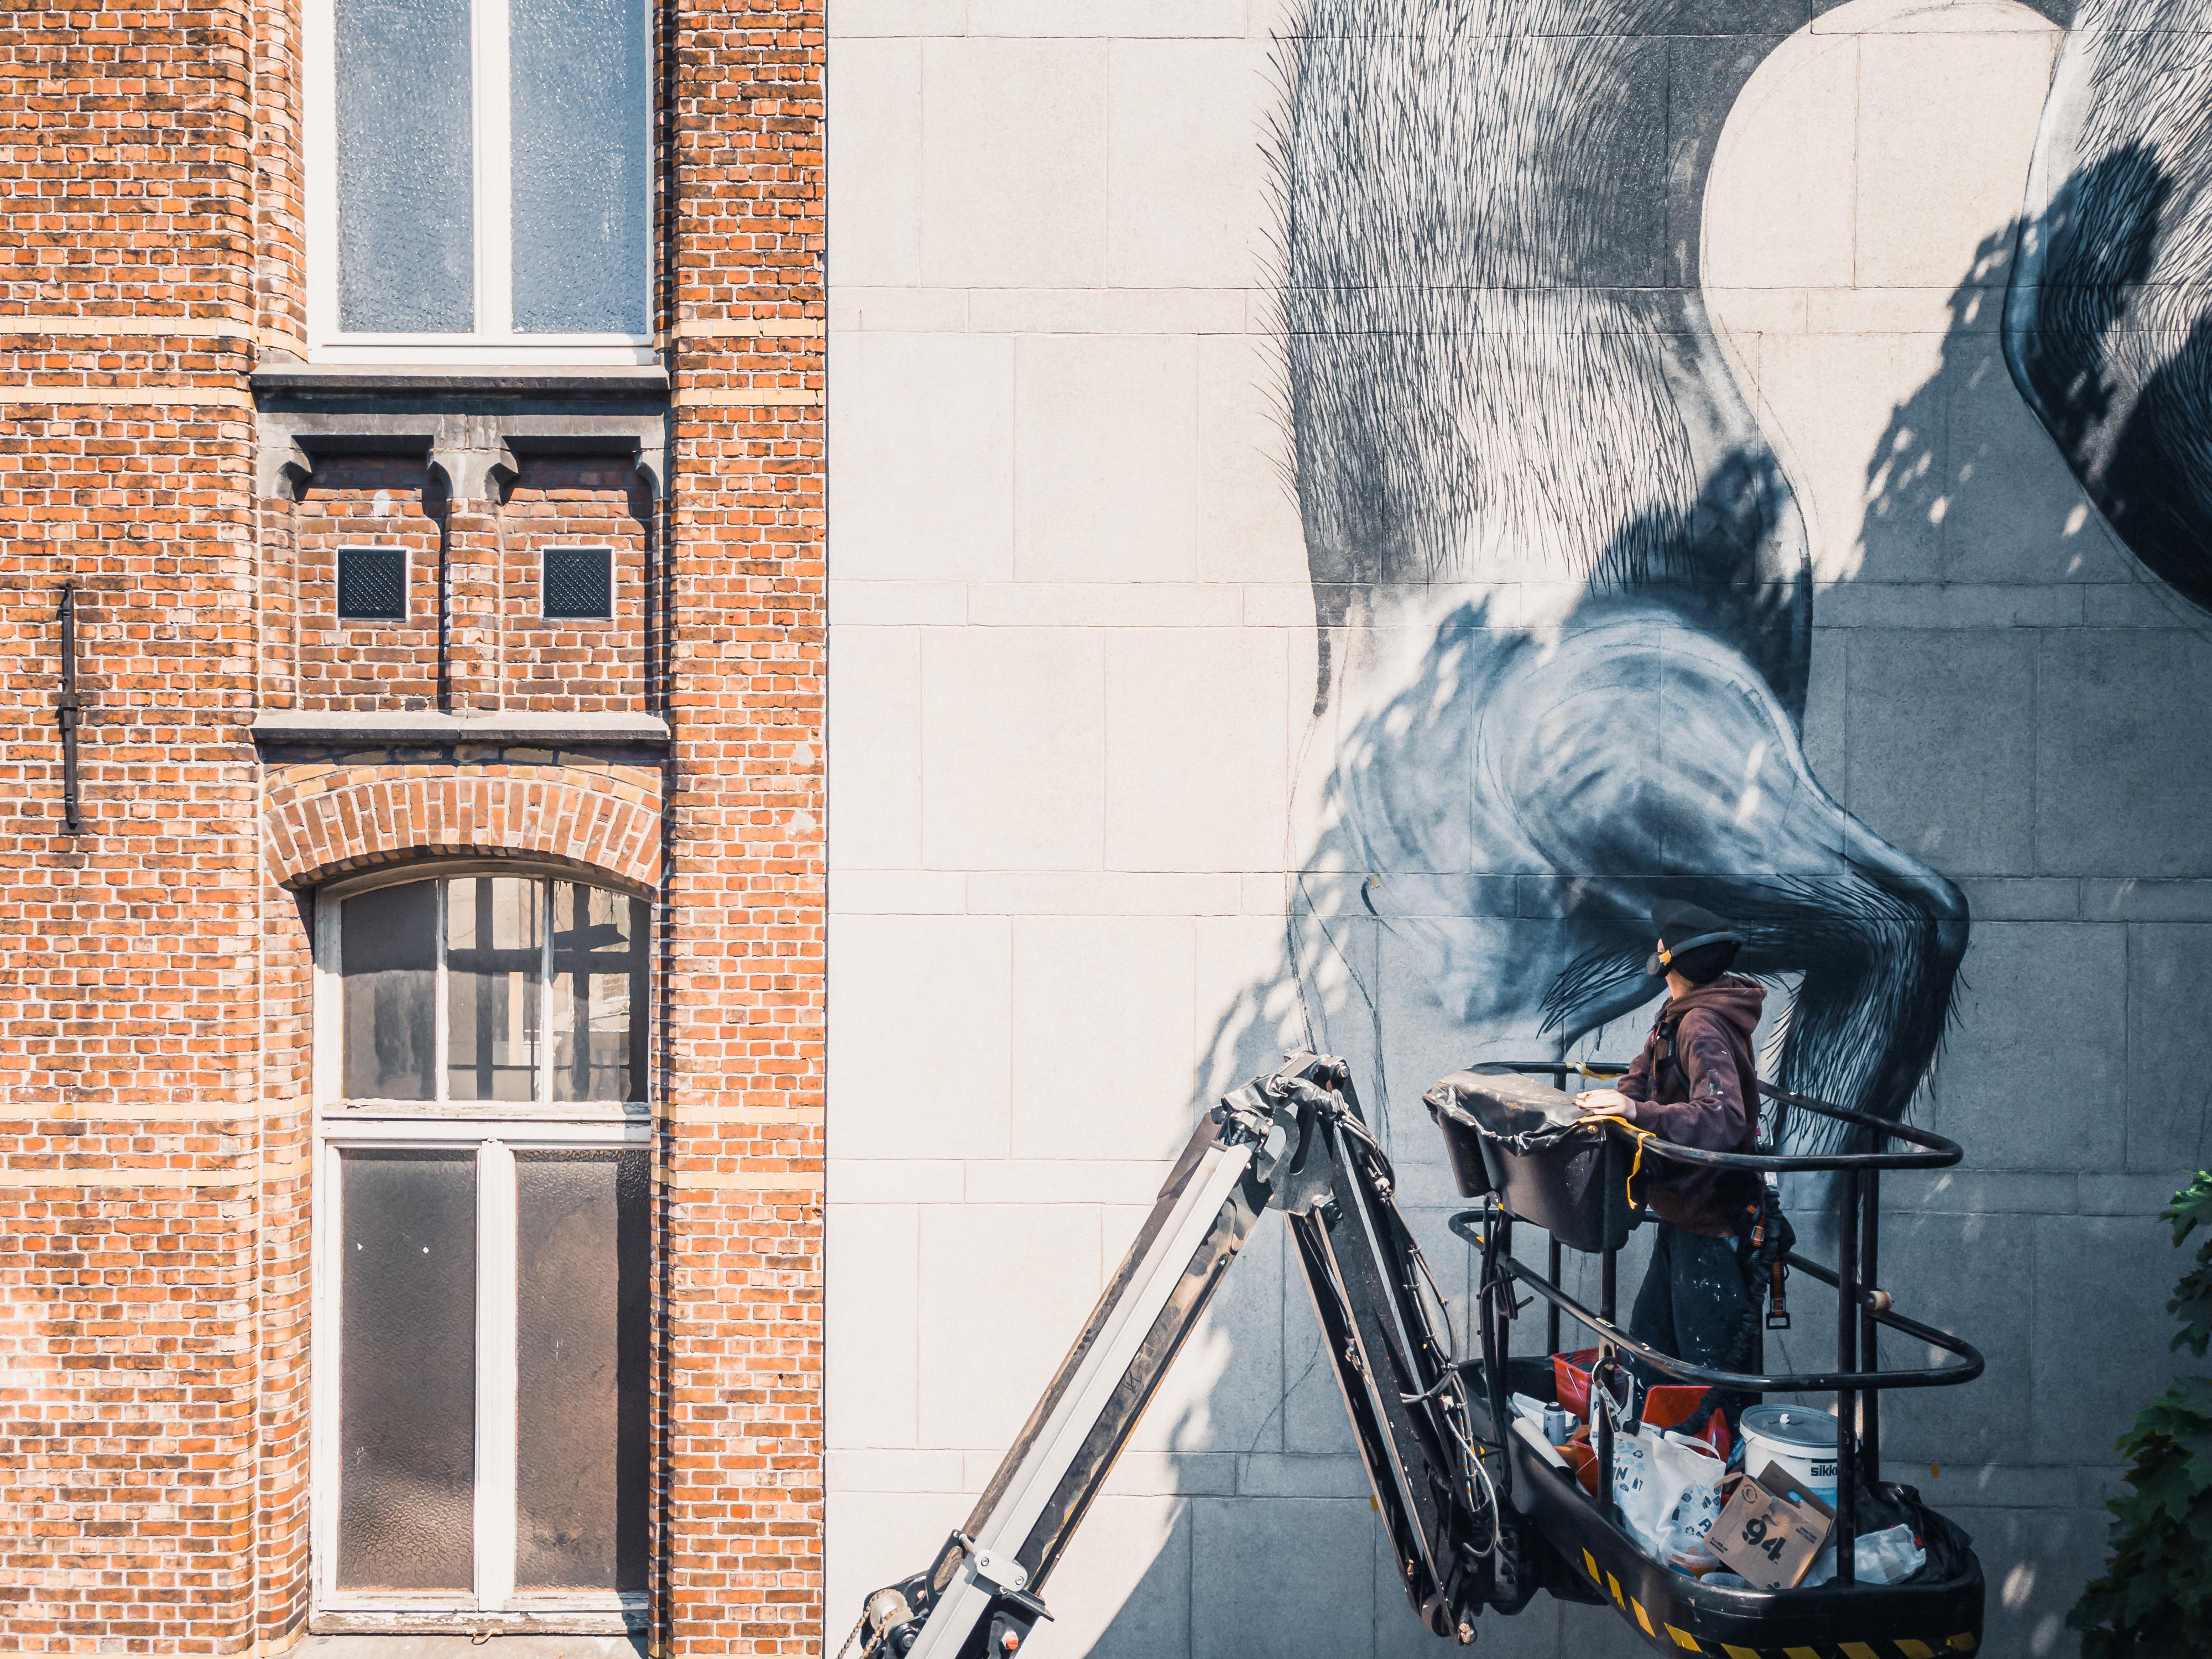 © Stad Gent – Dienst Toerisme – Martin Corlazzoli